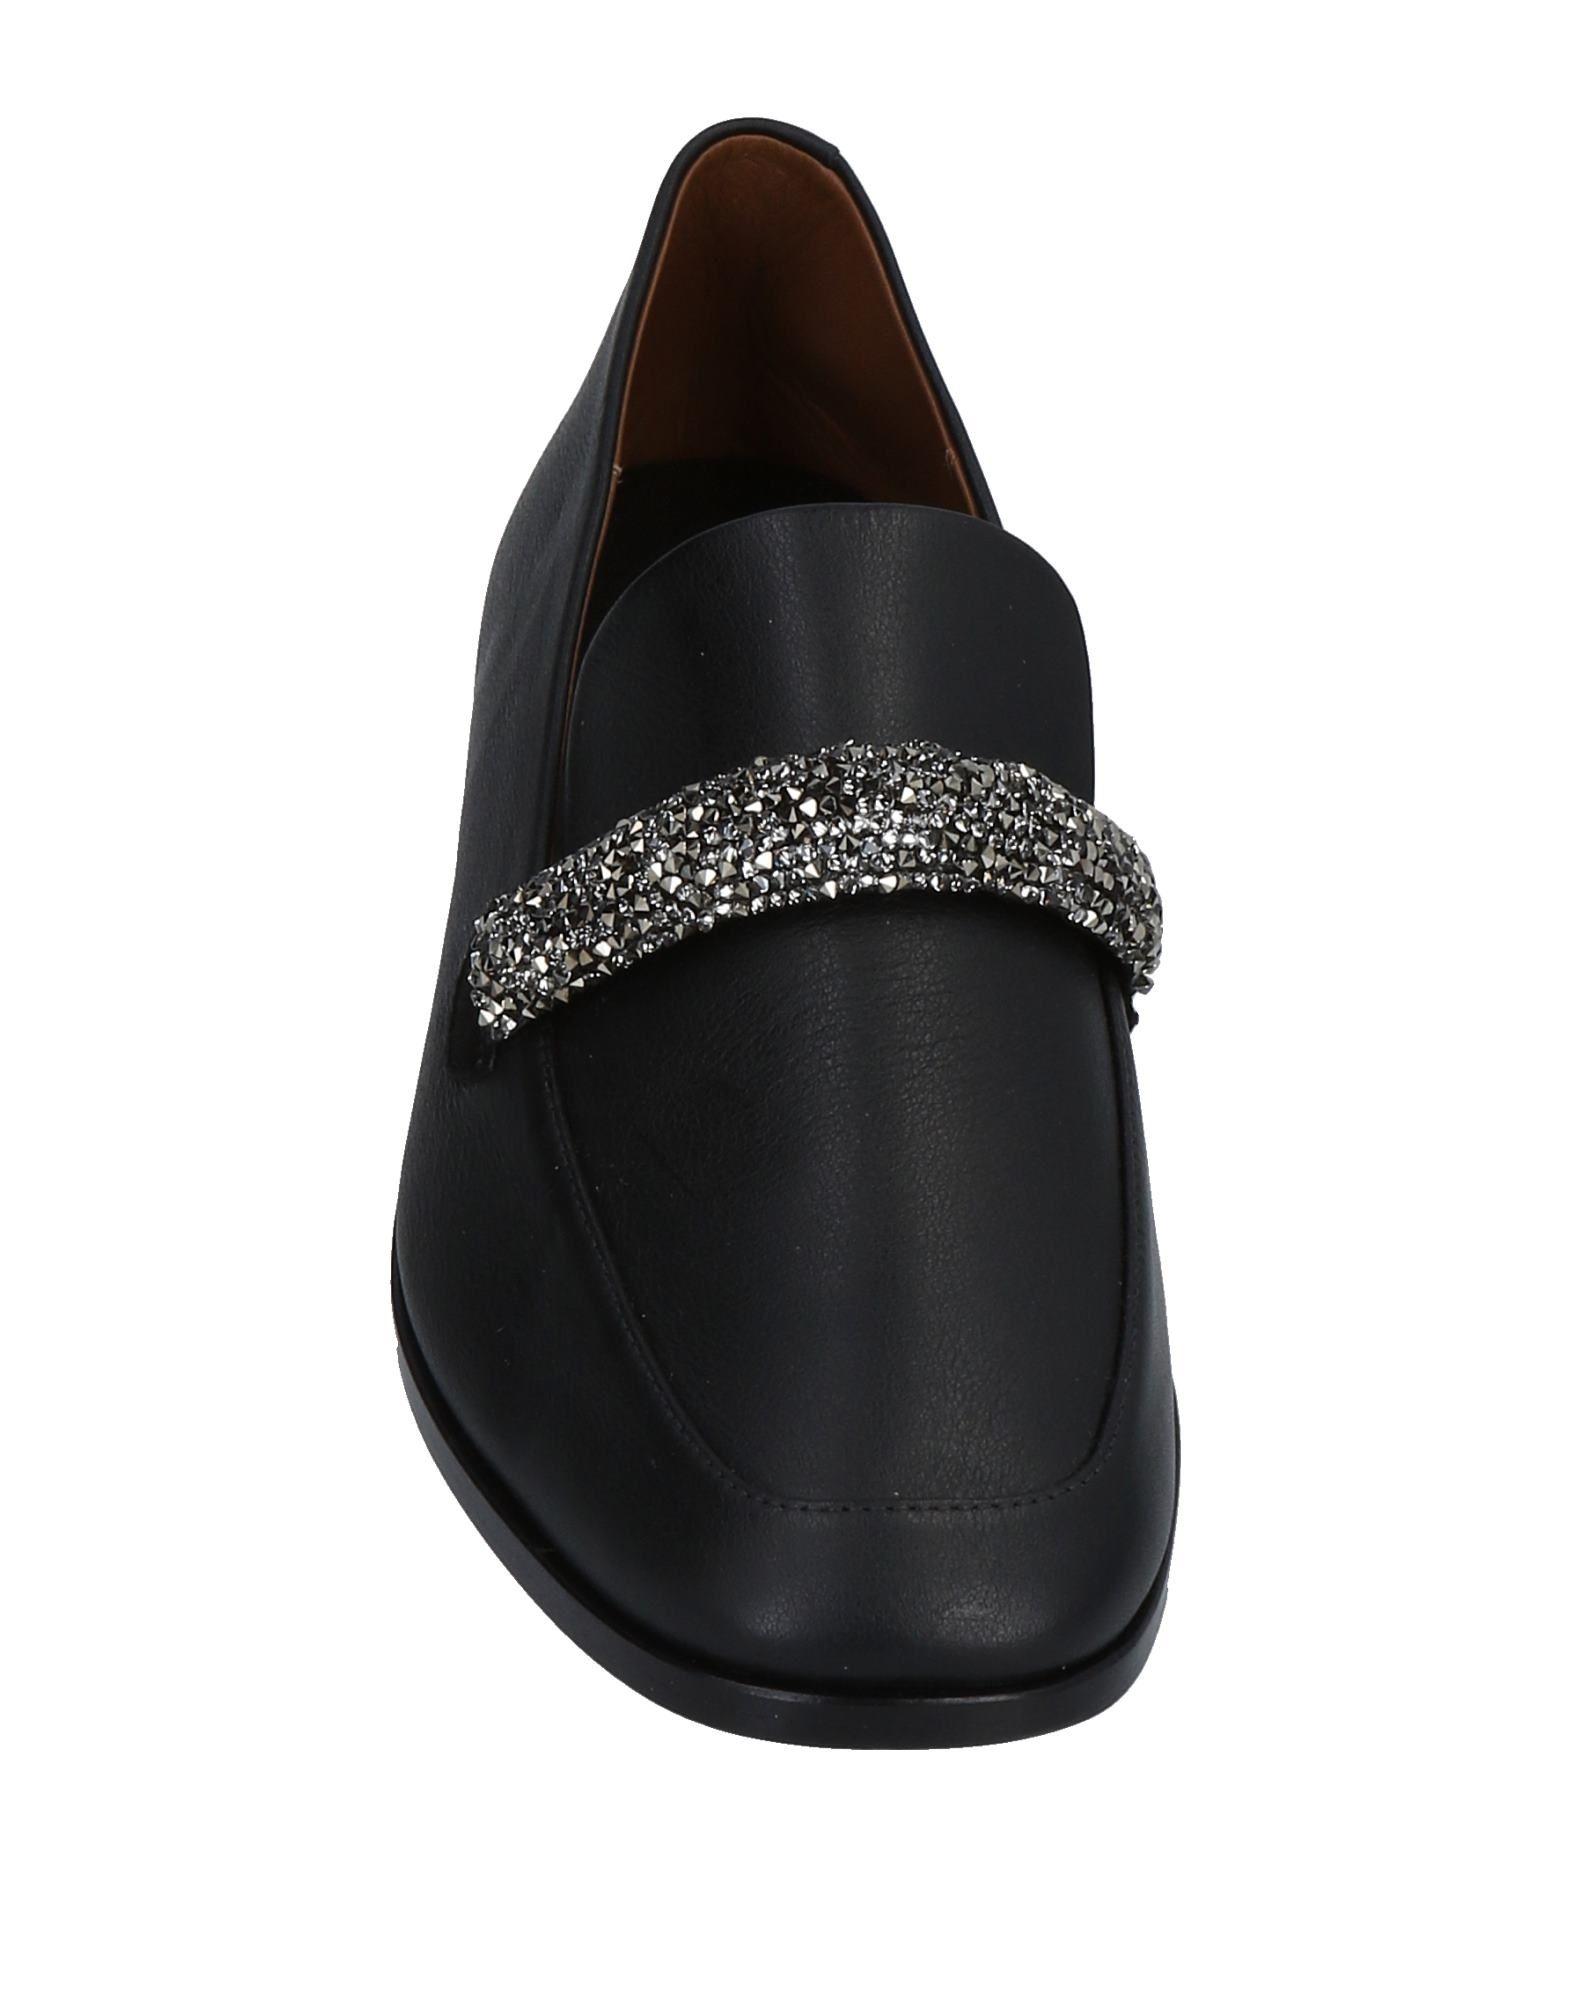 Moda Mocassino Newbark Donna - 11479657WT